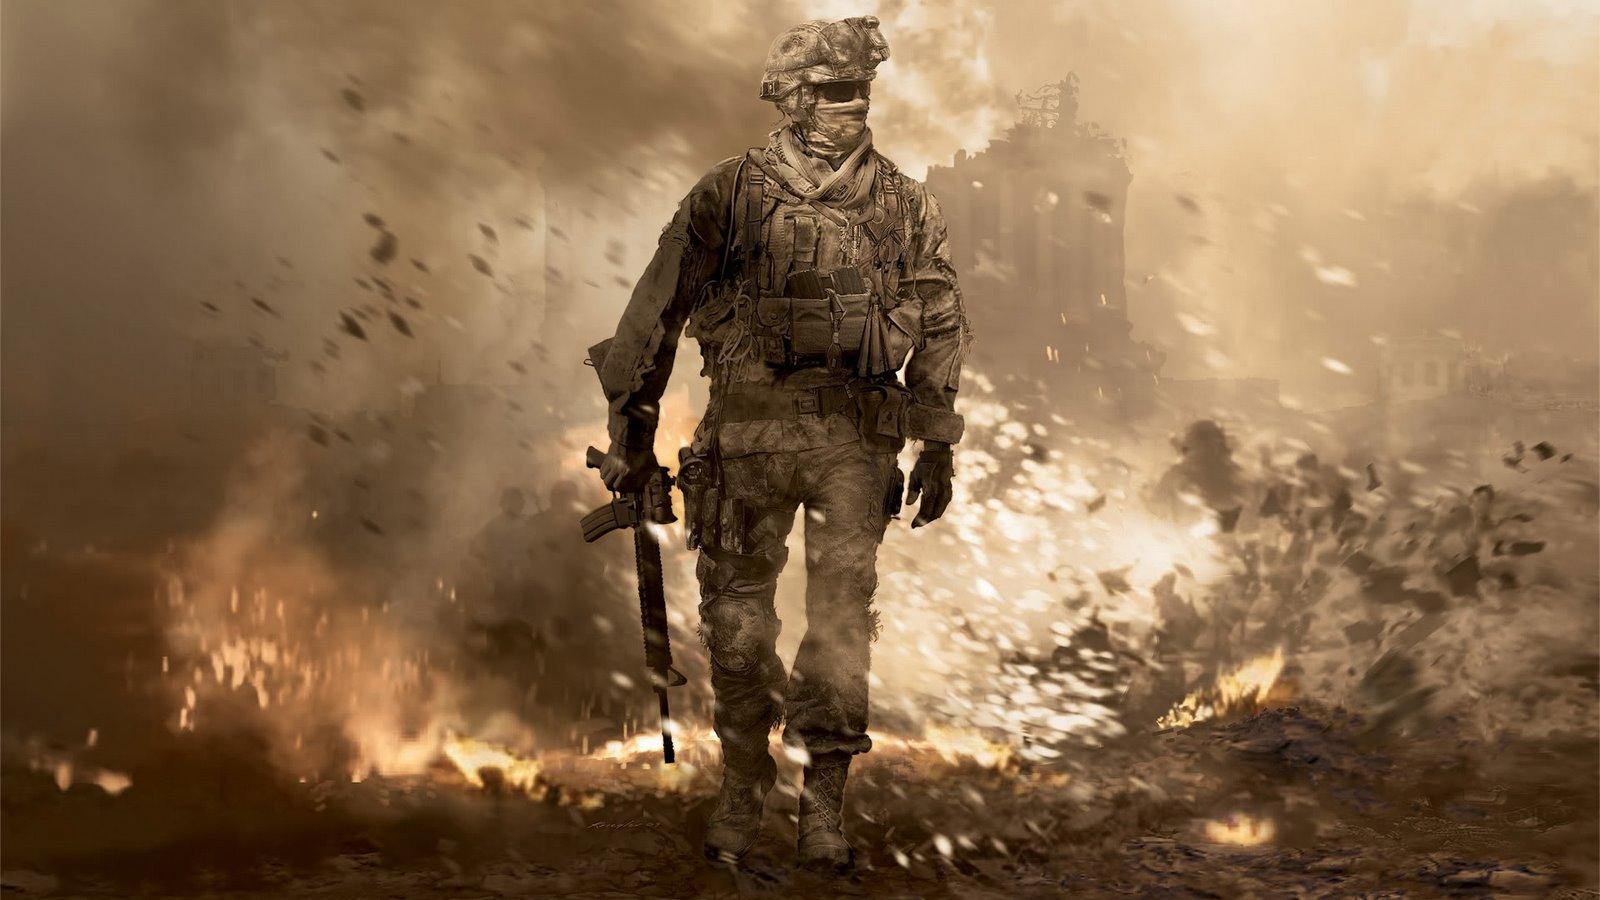 Call of Duty hd wallpaper 1600x900